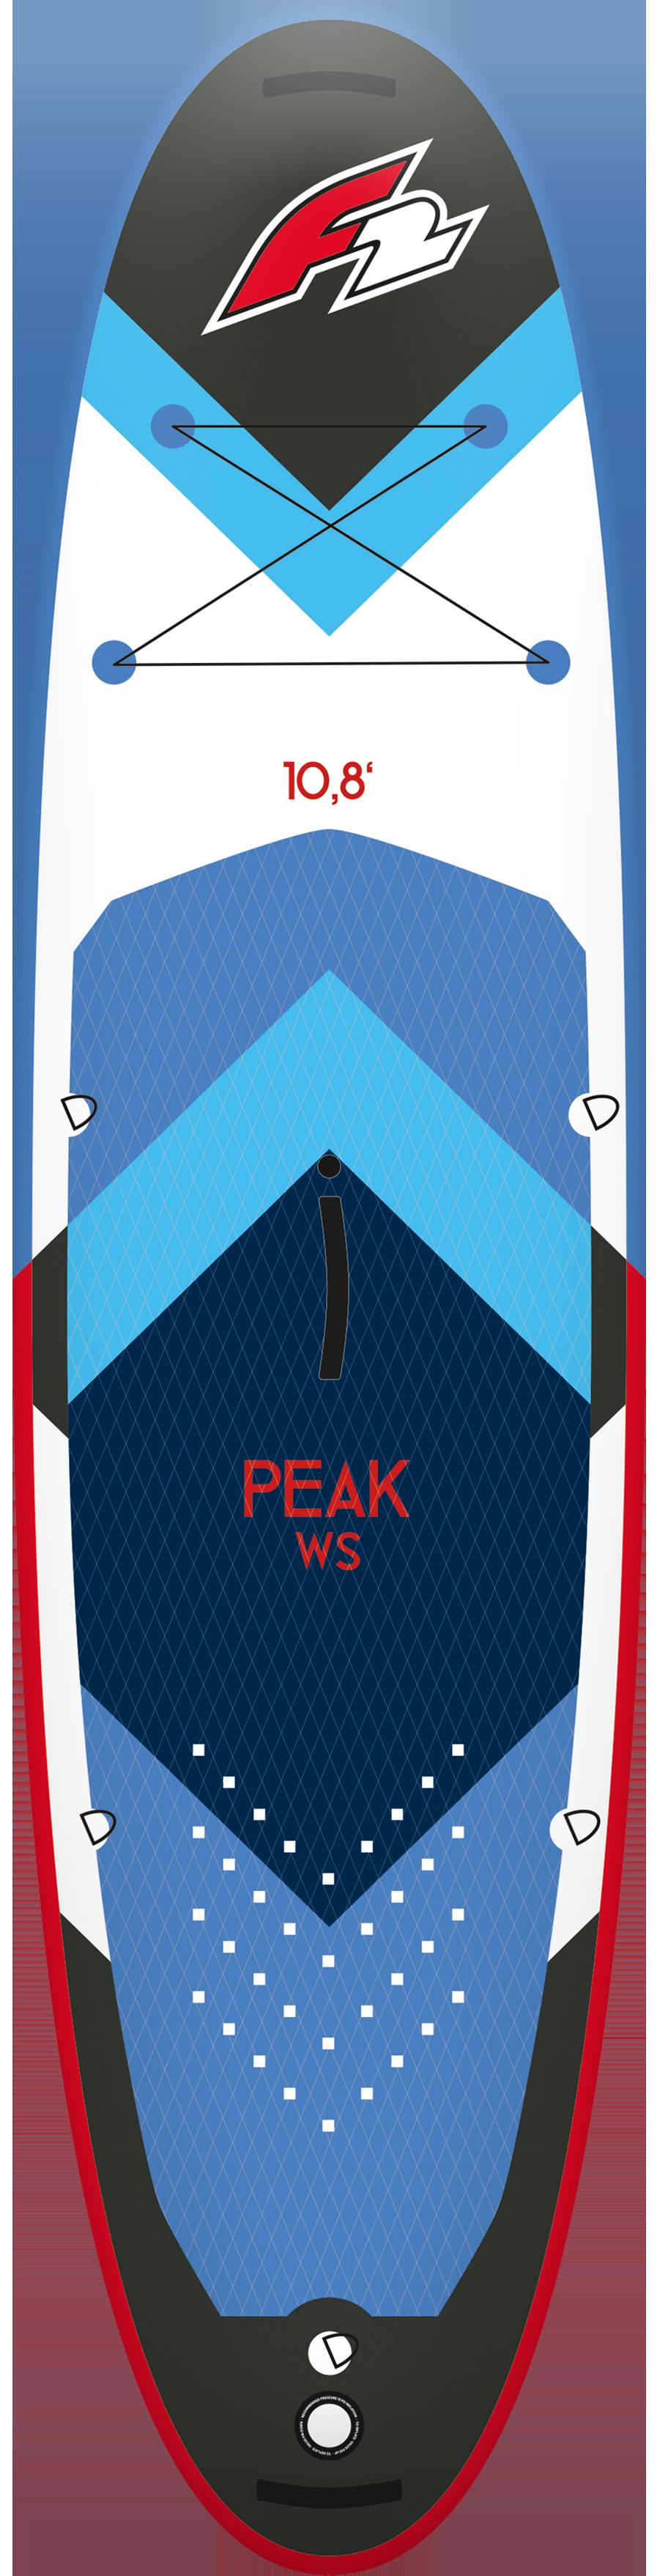 PEAK WINDSURF - Top